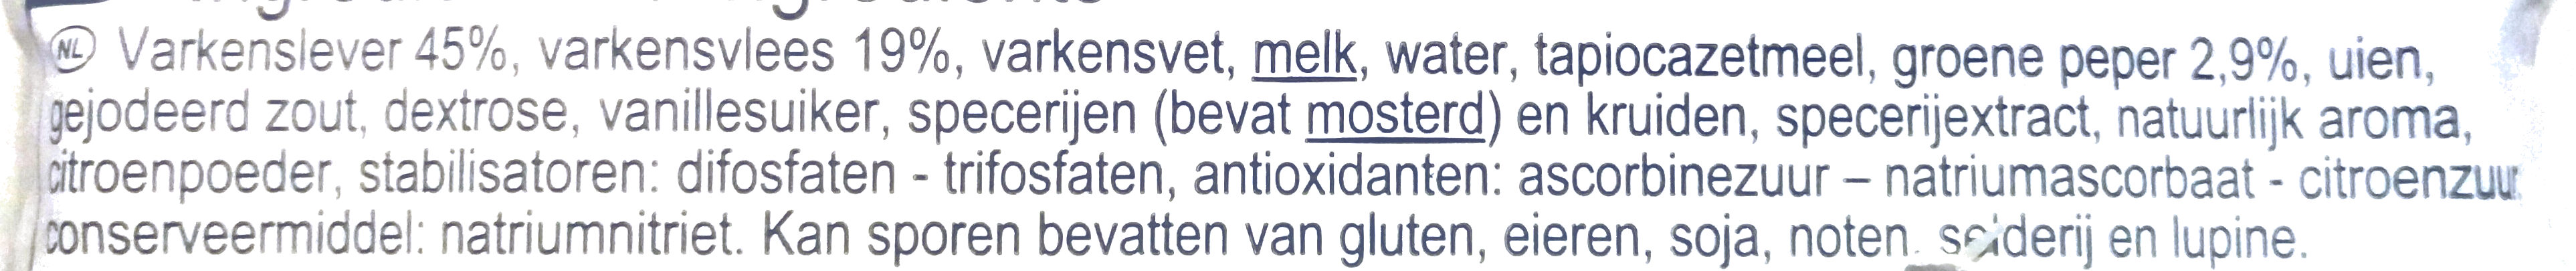 Pâté de campagne au poivre vert - Ingrediënten - nl